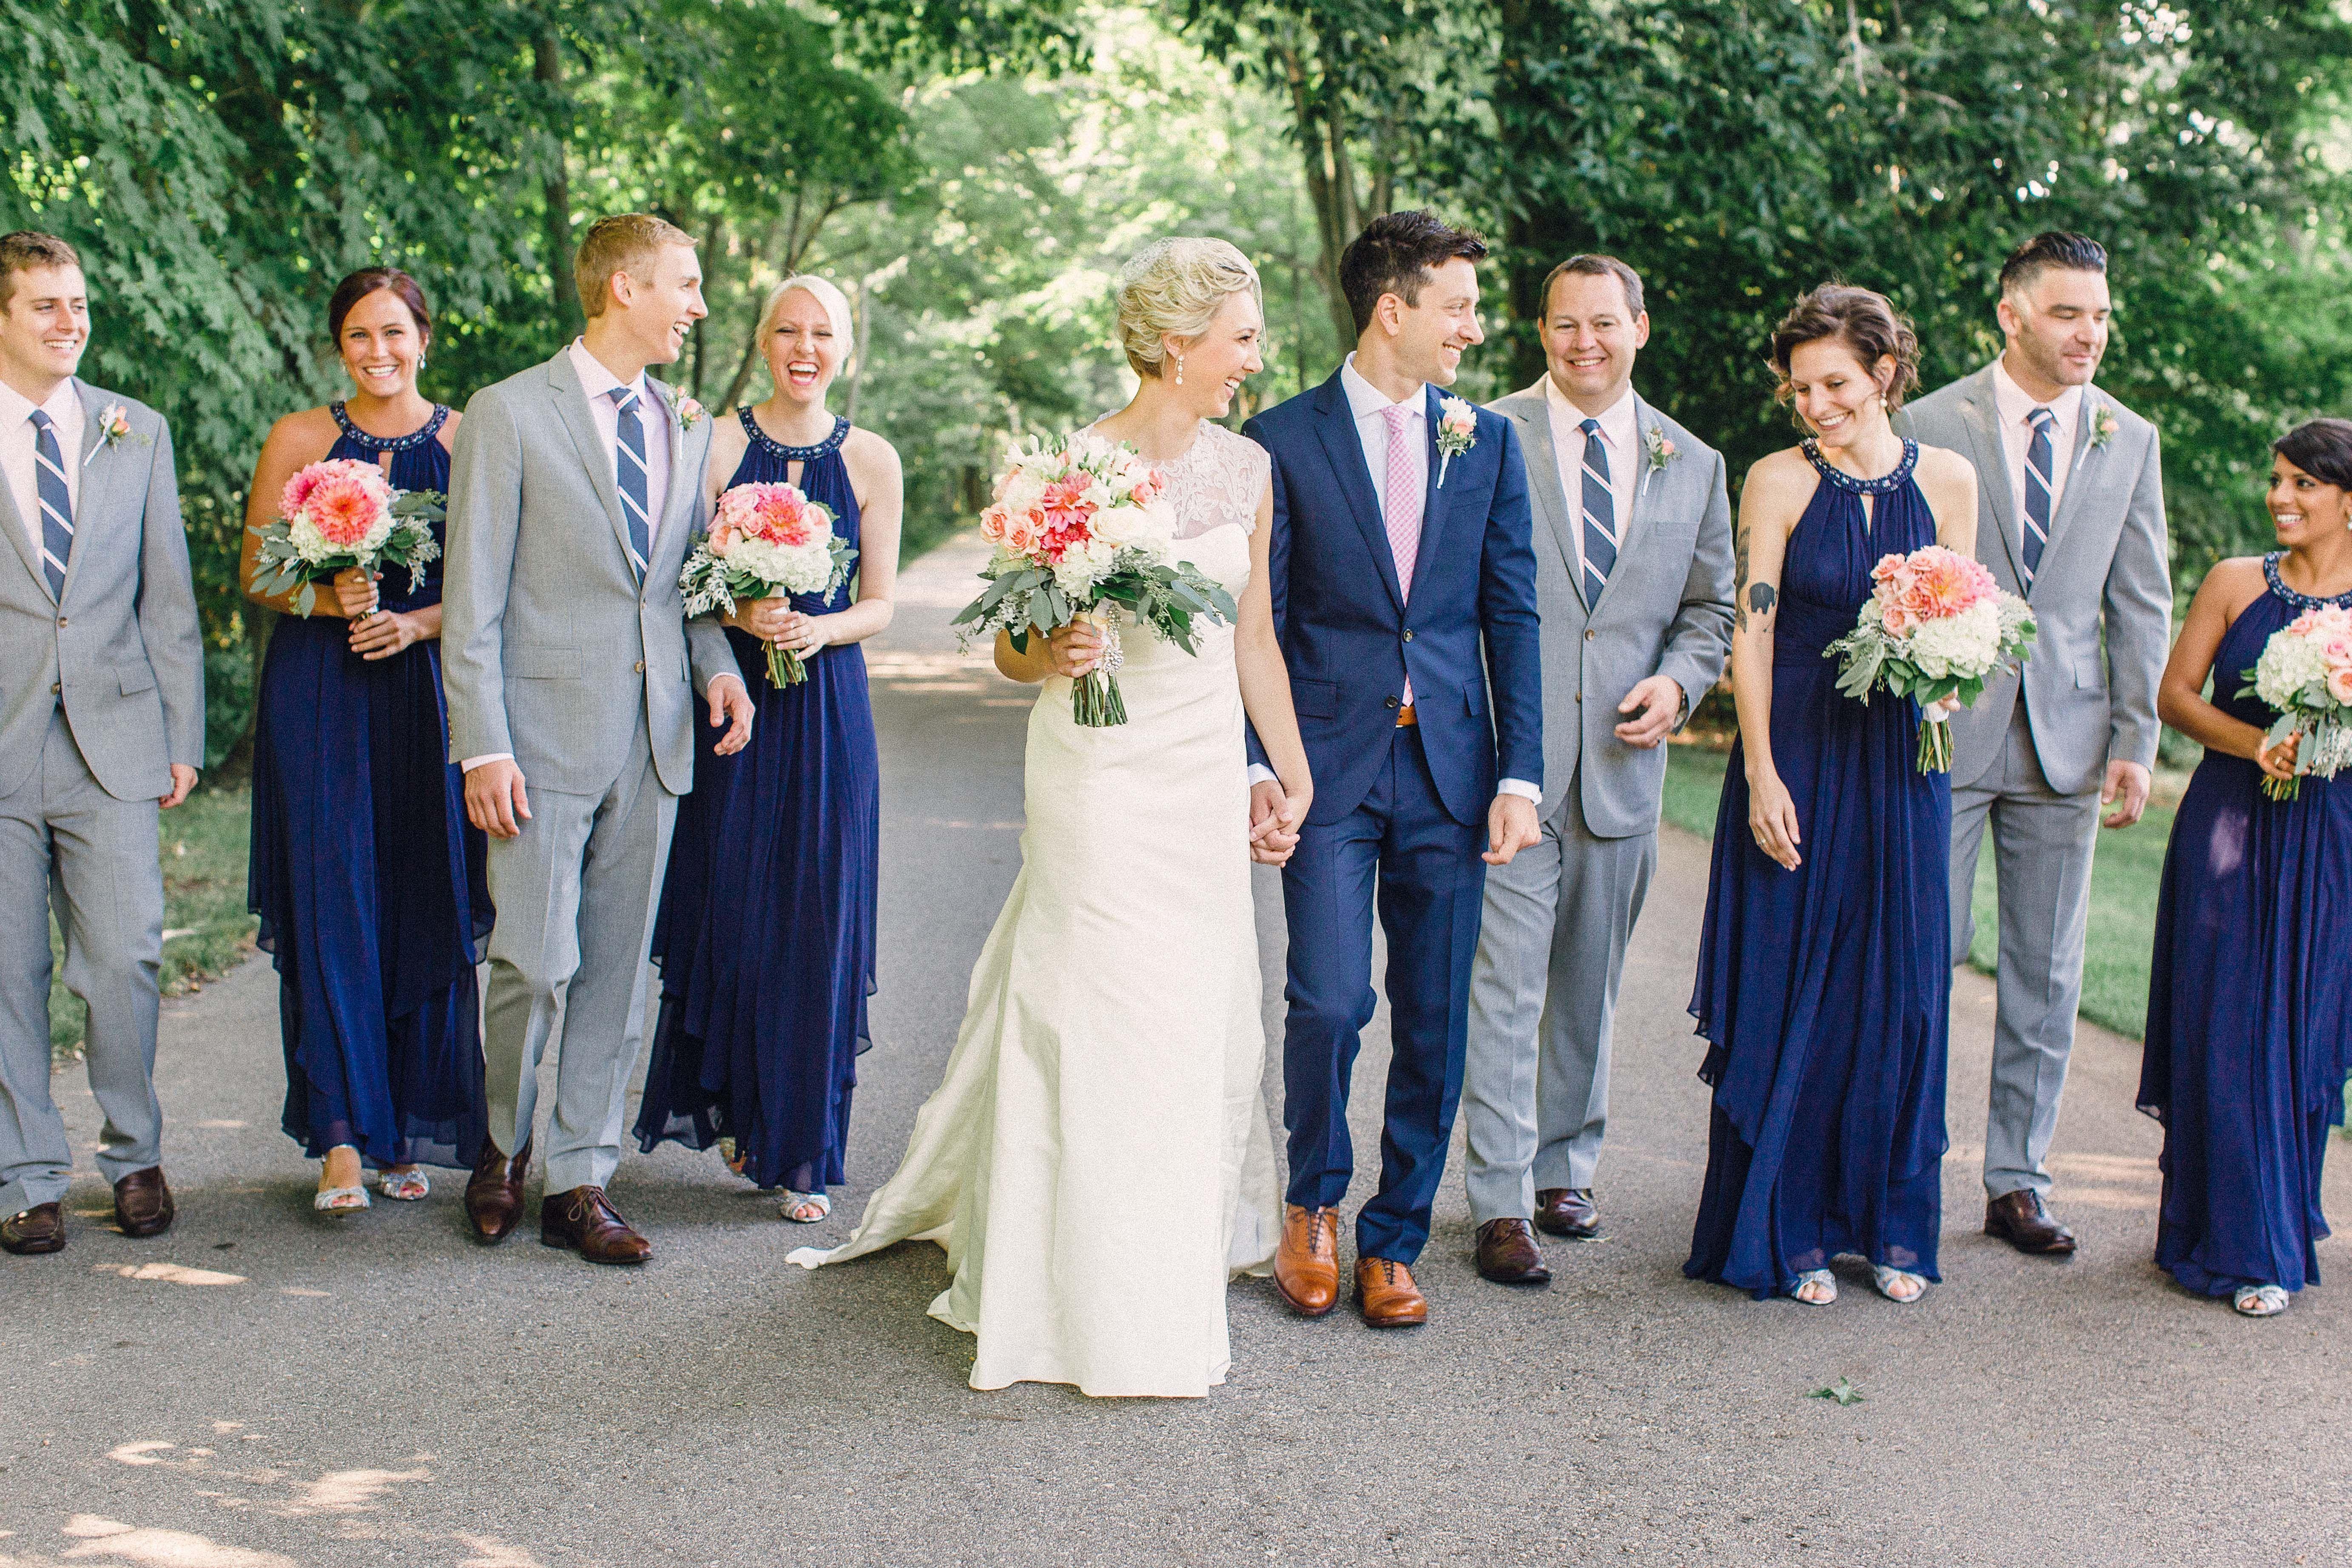 25 Best Charming Blue Tuxedo Wedding Dress Ideas Navy Bridal Parties Gray Wedding Party Grey Bridal Parties [ 3687 x 5531 Pixel ]